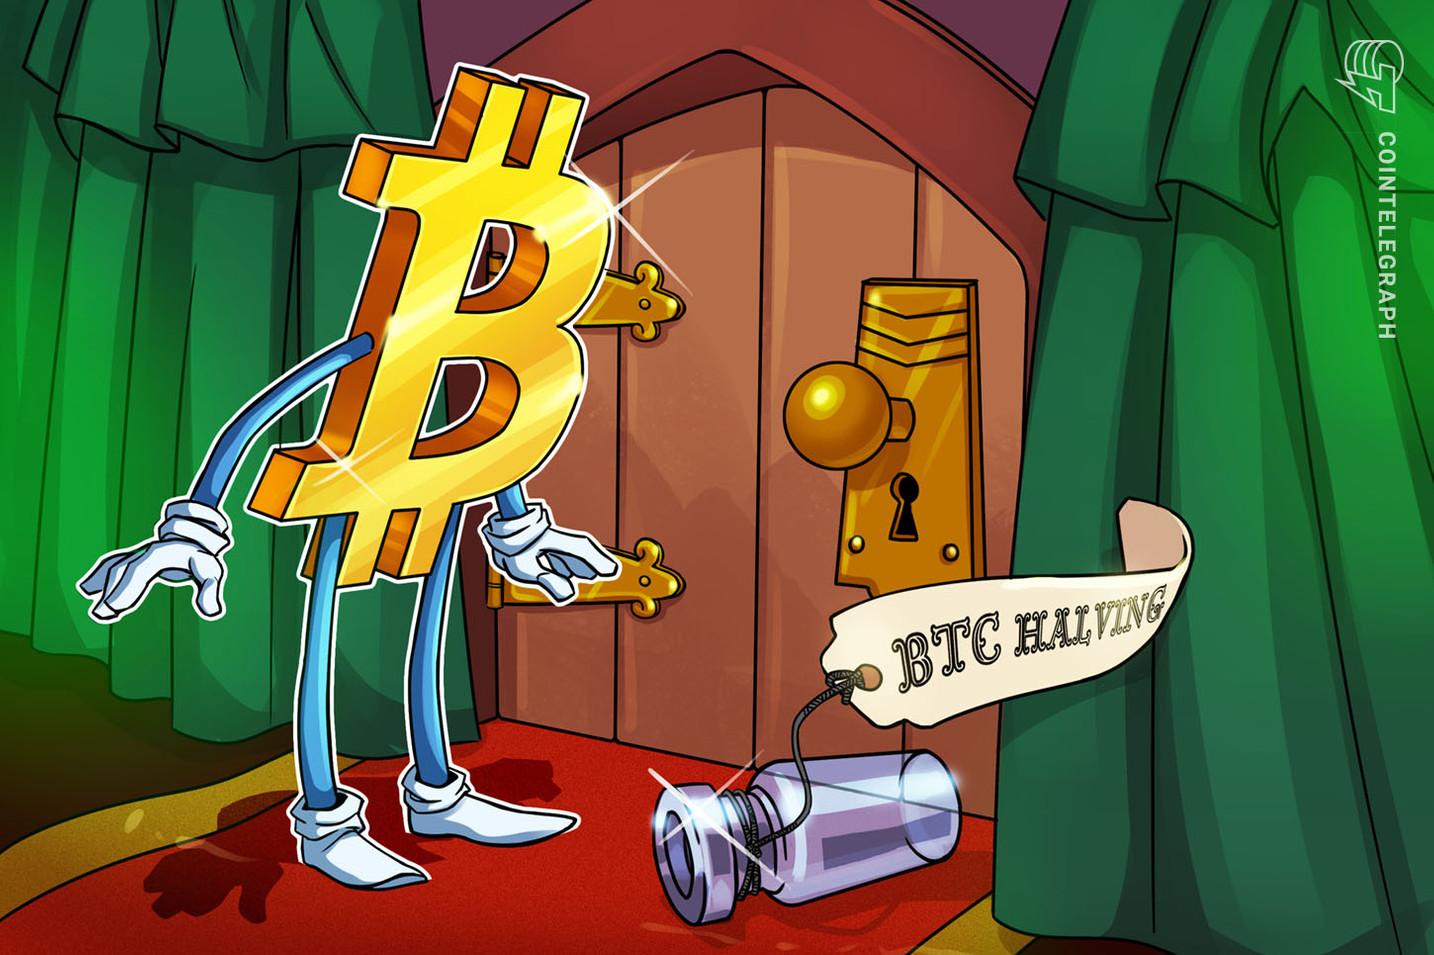 İddia: Halving Sonrası Bitcoin'in Fiyatı Yükselmeyebilir